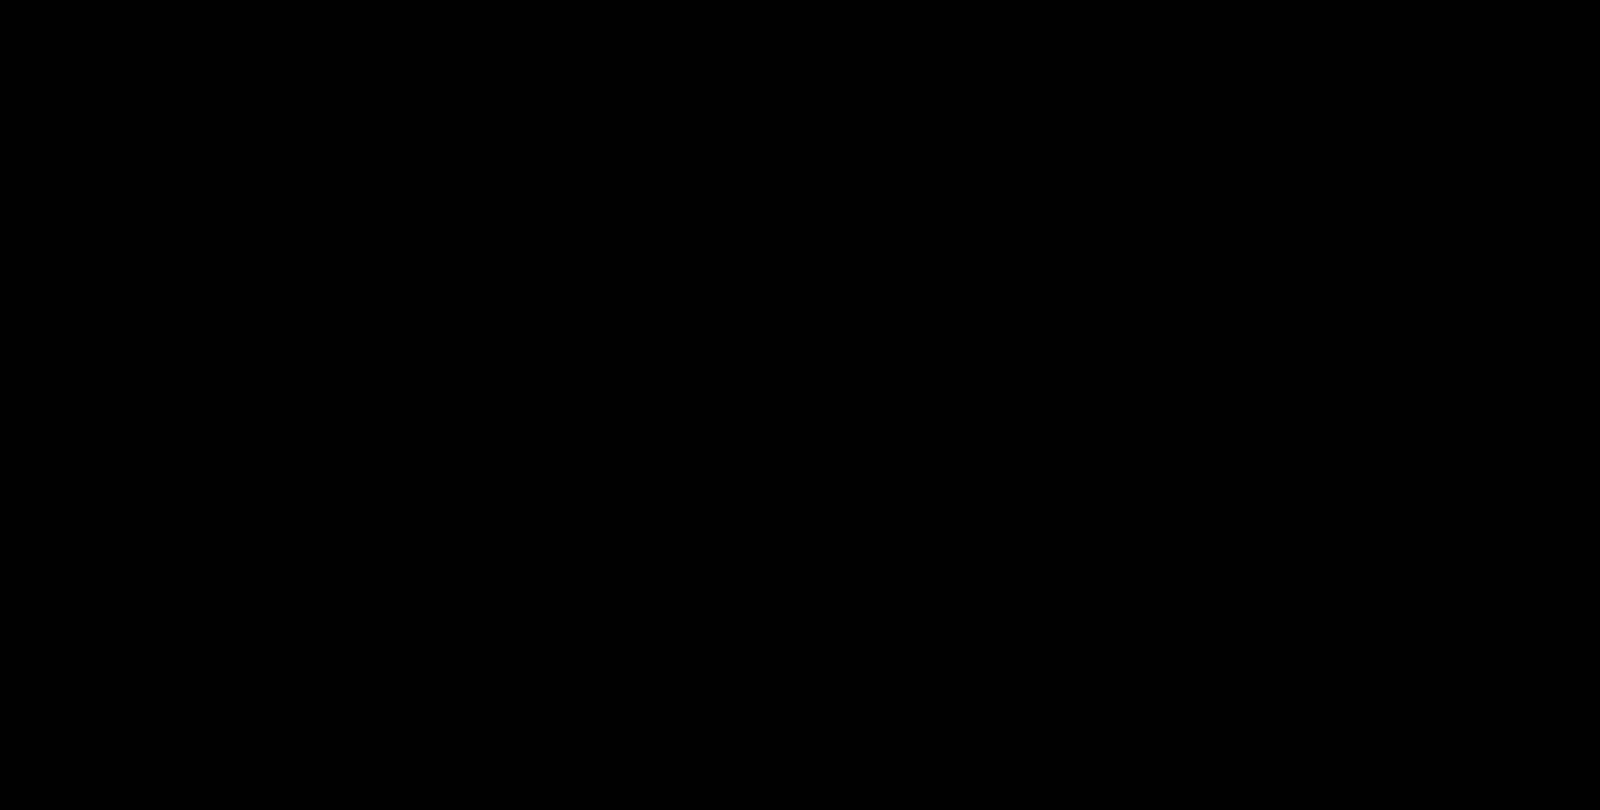 Viljelyohjeet: Punakuorinen uutuuslajike Rosi